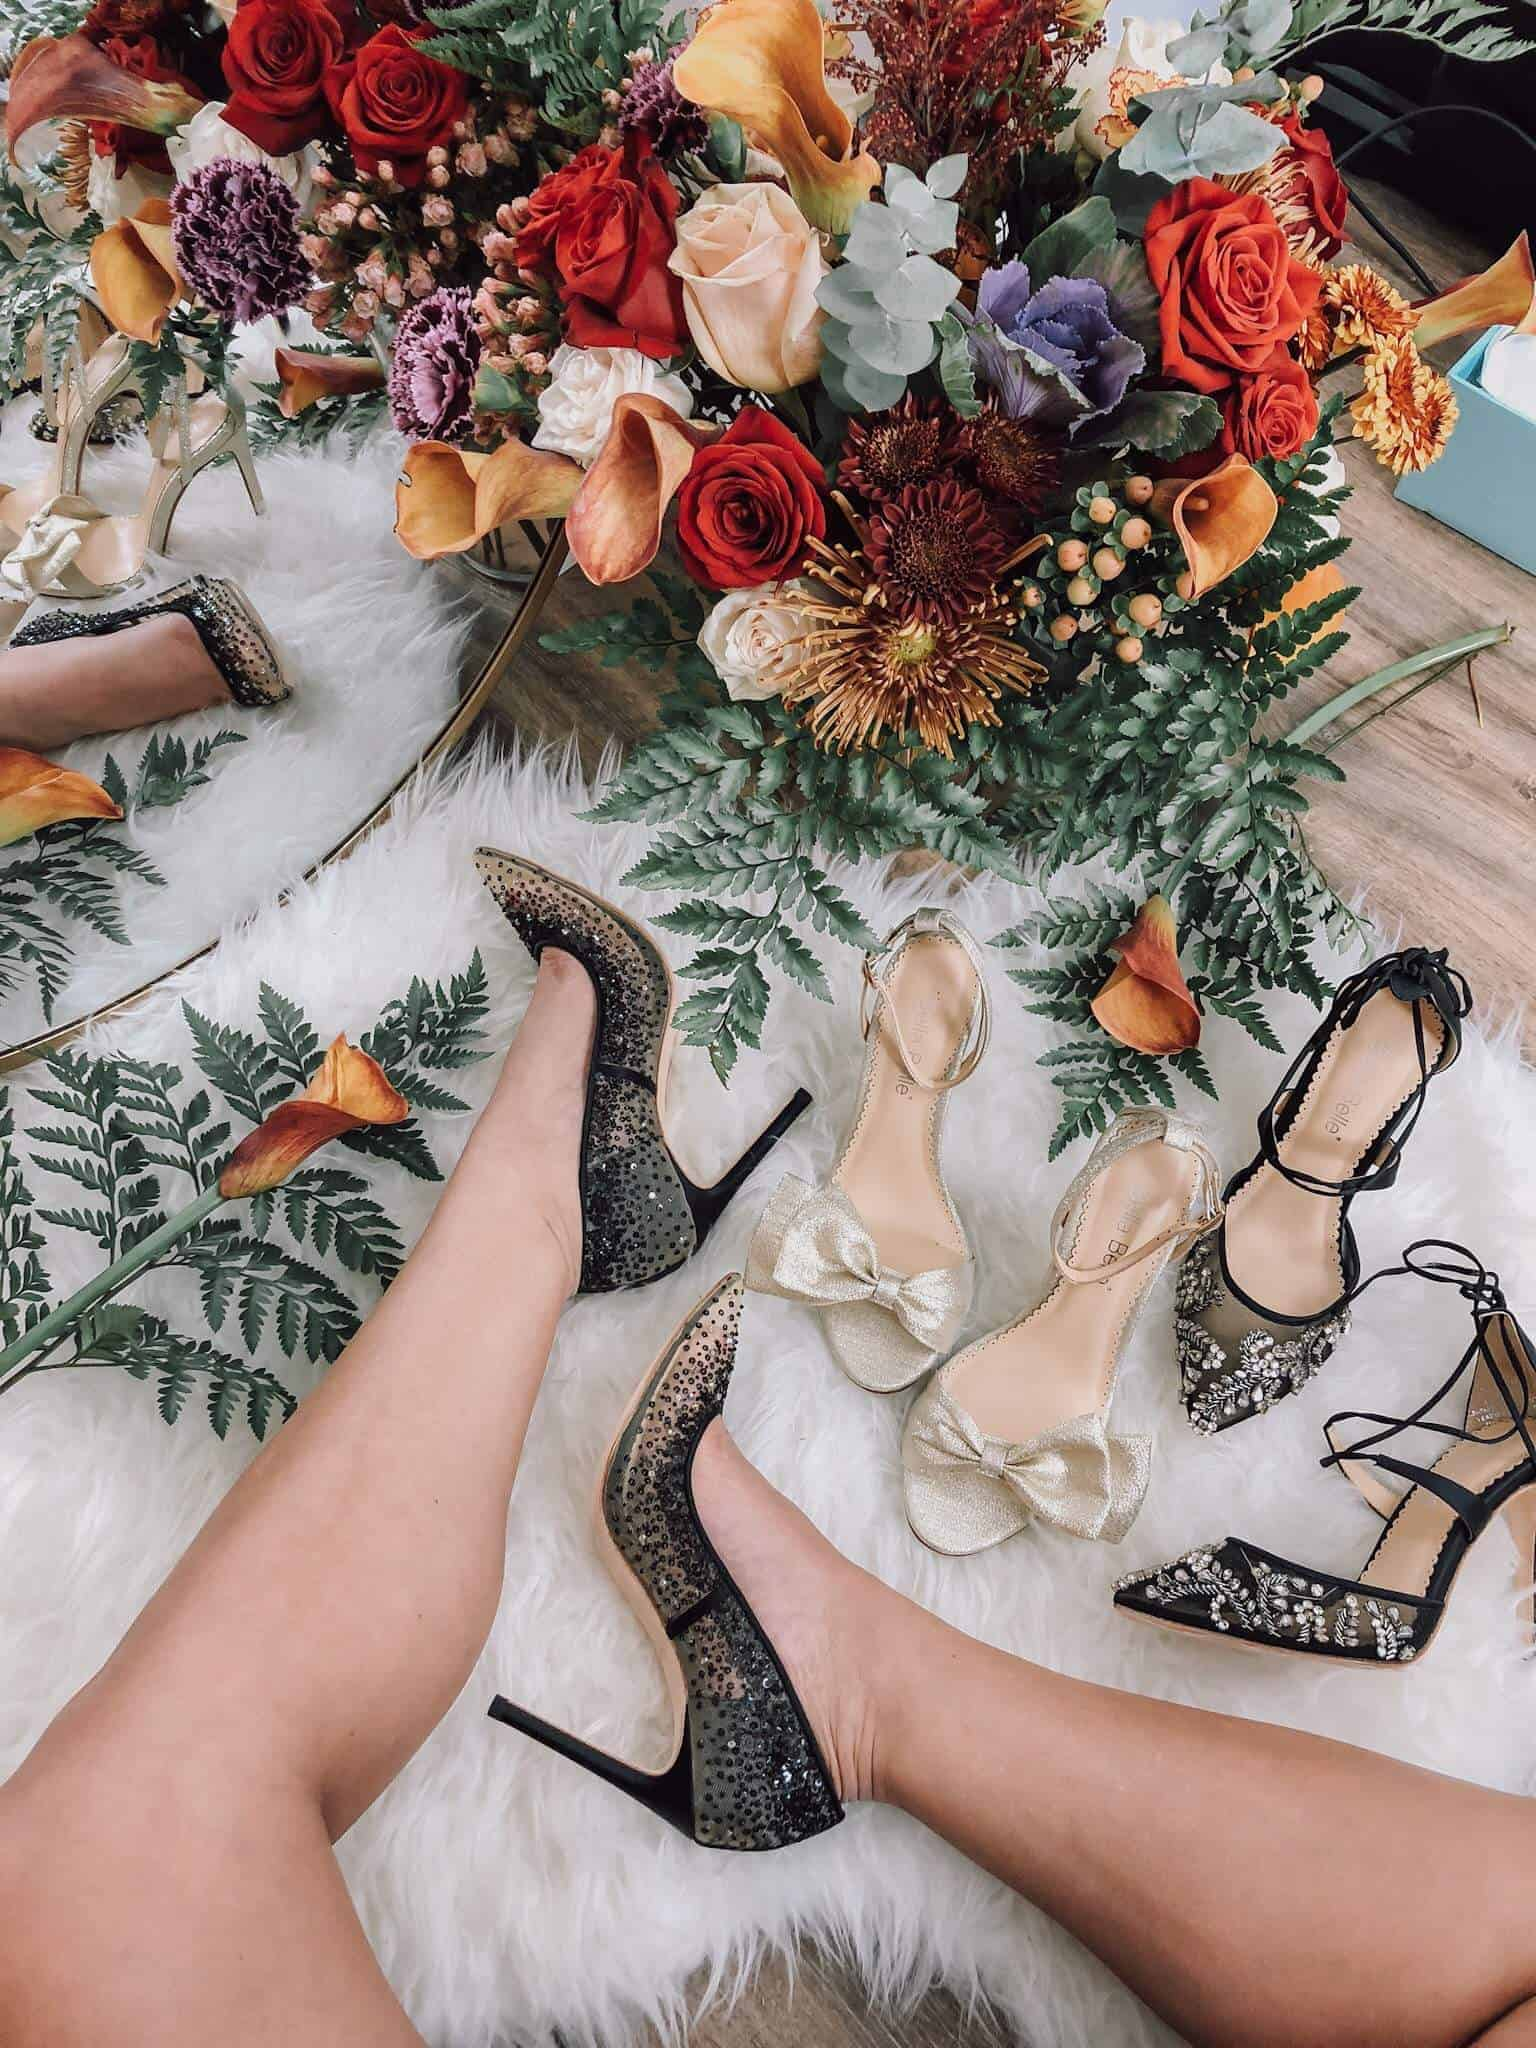 Bella Belle shoes review, best bridal shoes, best wedding guest heels, A Lily Love Affair, Chicago Blogger